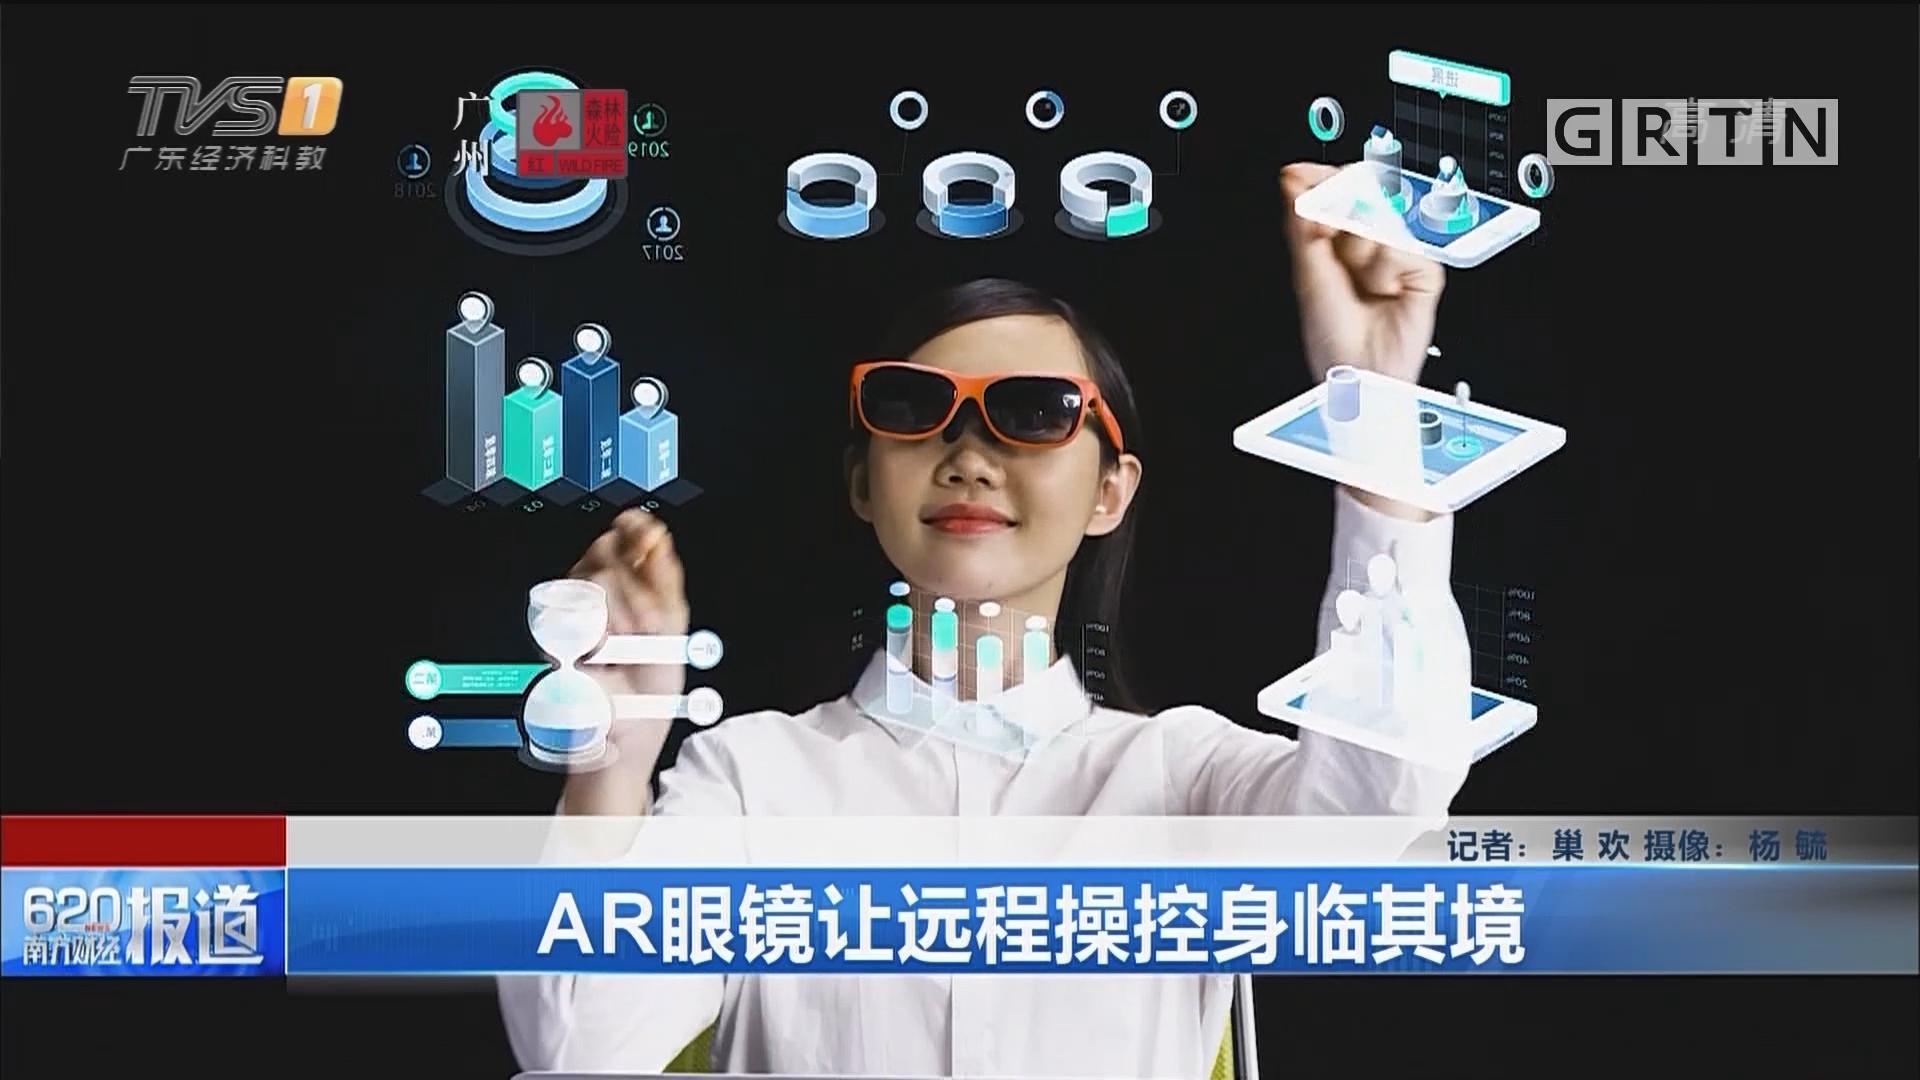 AR眼镜让远程操控身临其境